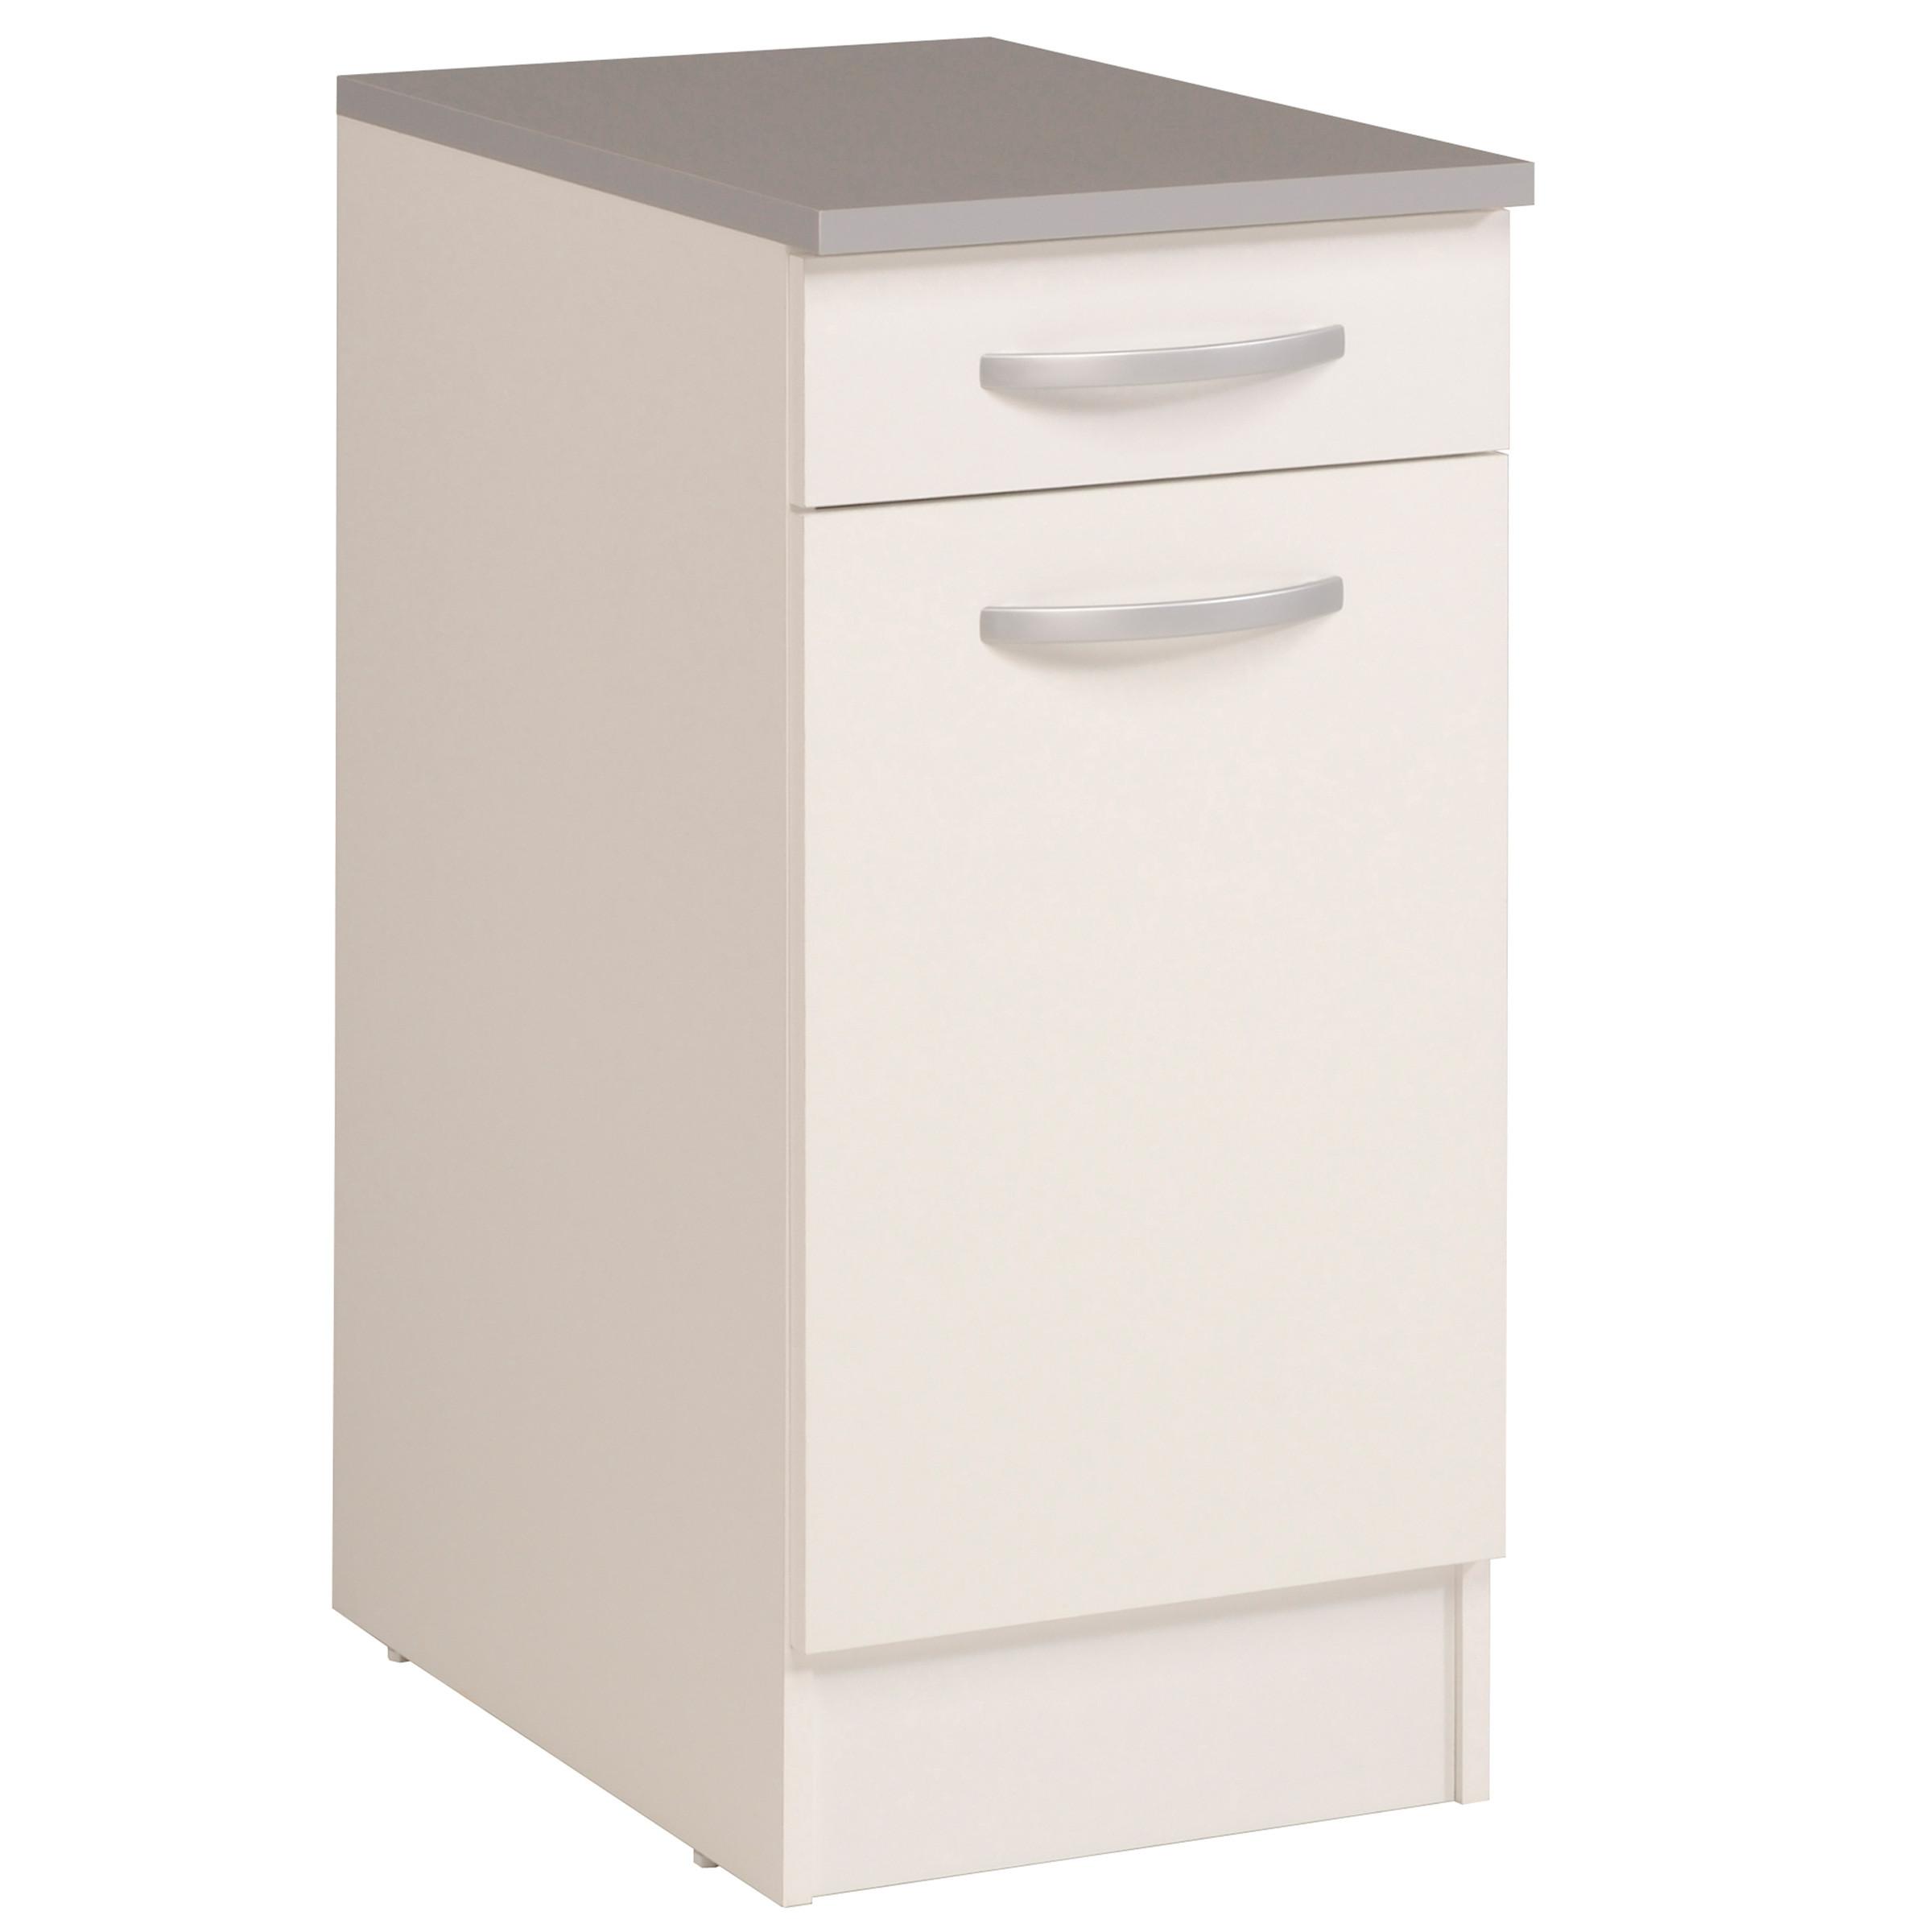 Meuble bas de cuisine contemporain 40 cm 1 porte/1 tiroir blanc brillant Bianco